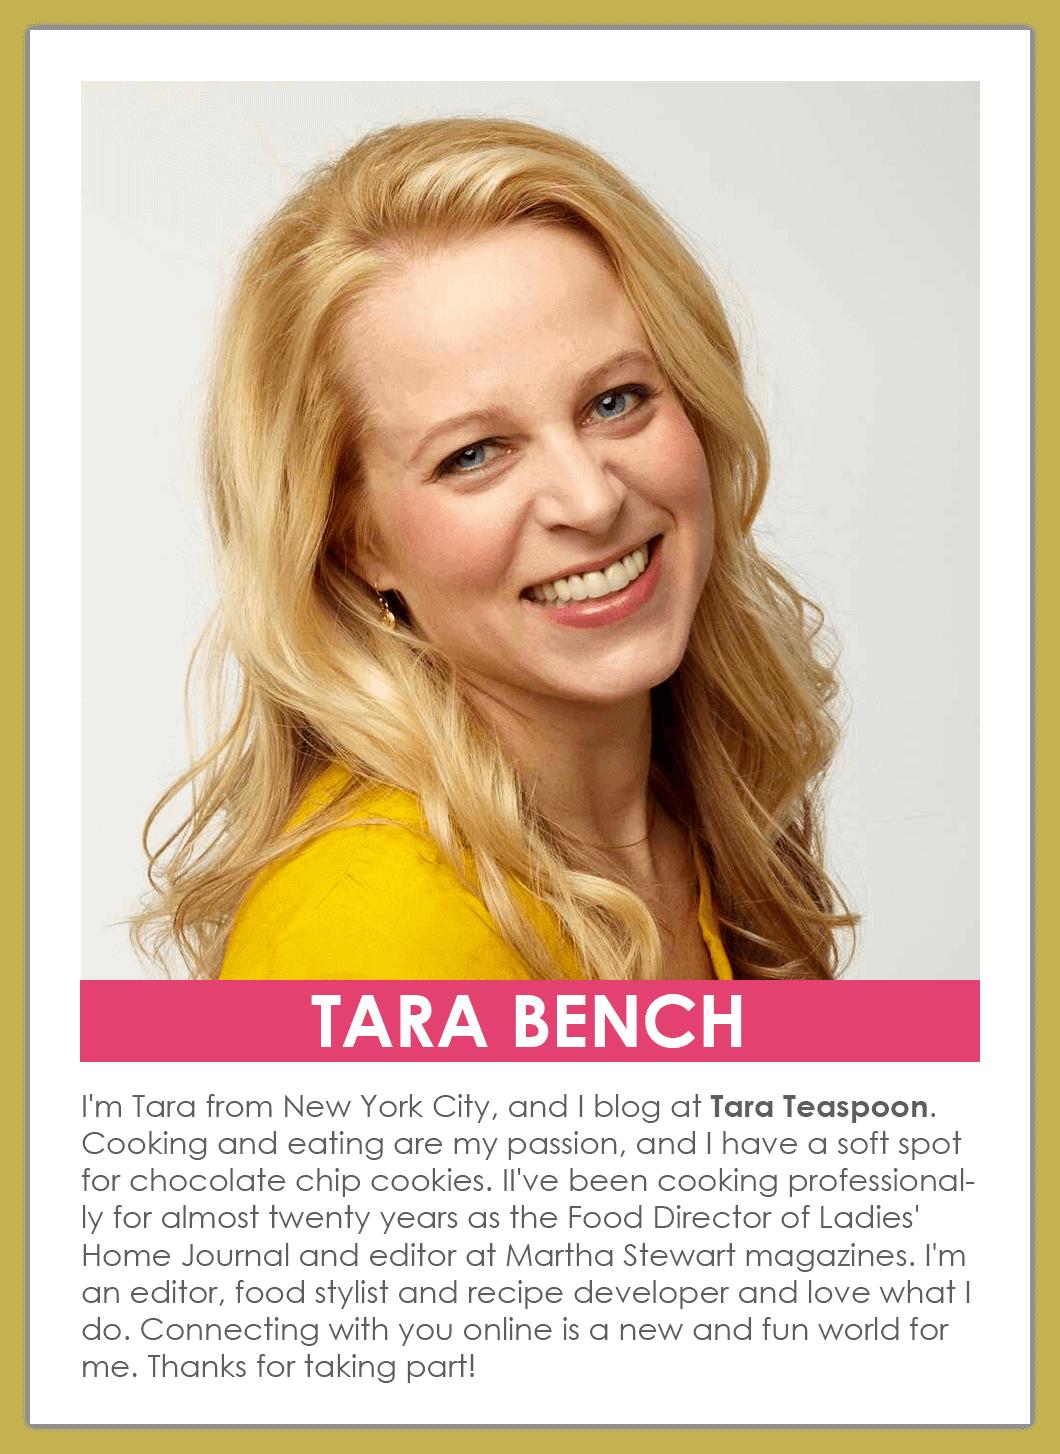 Tara Bench